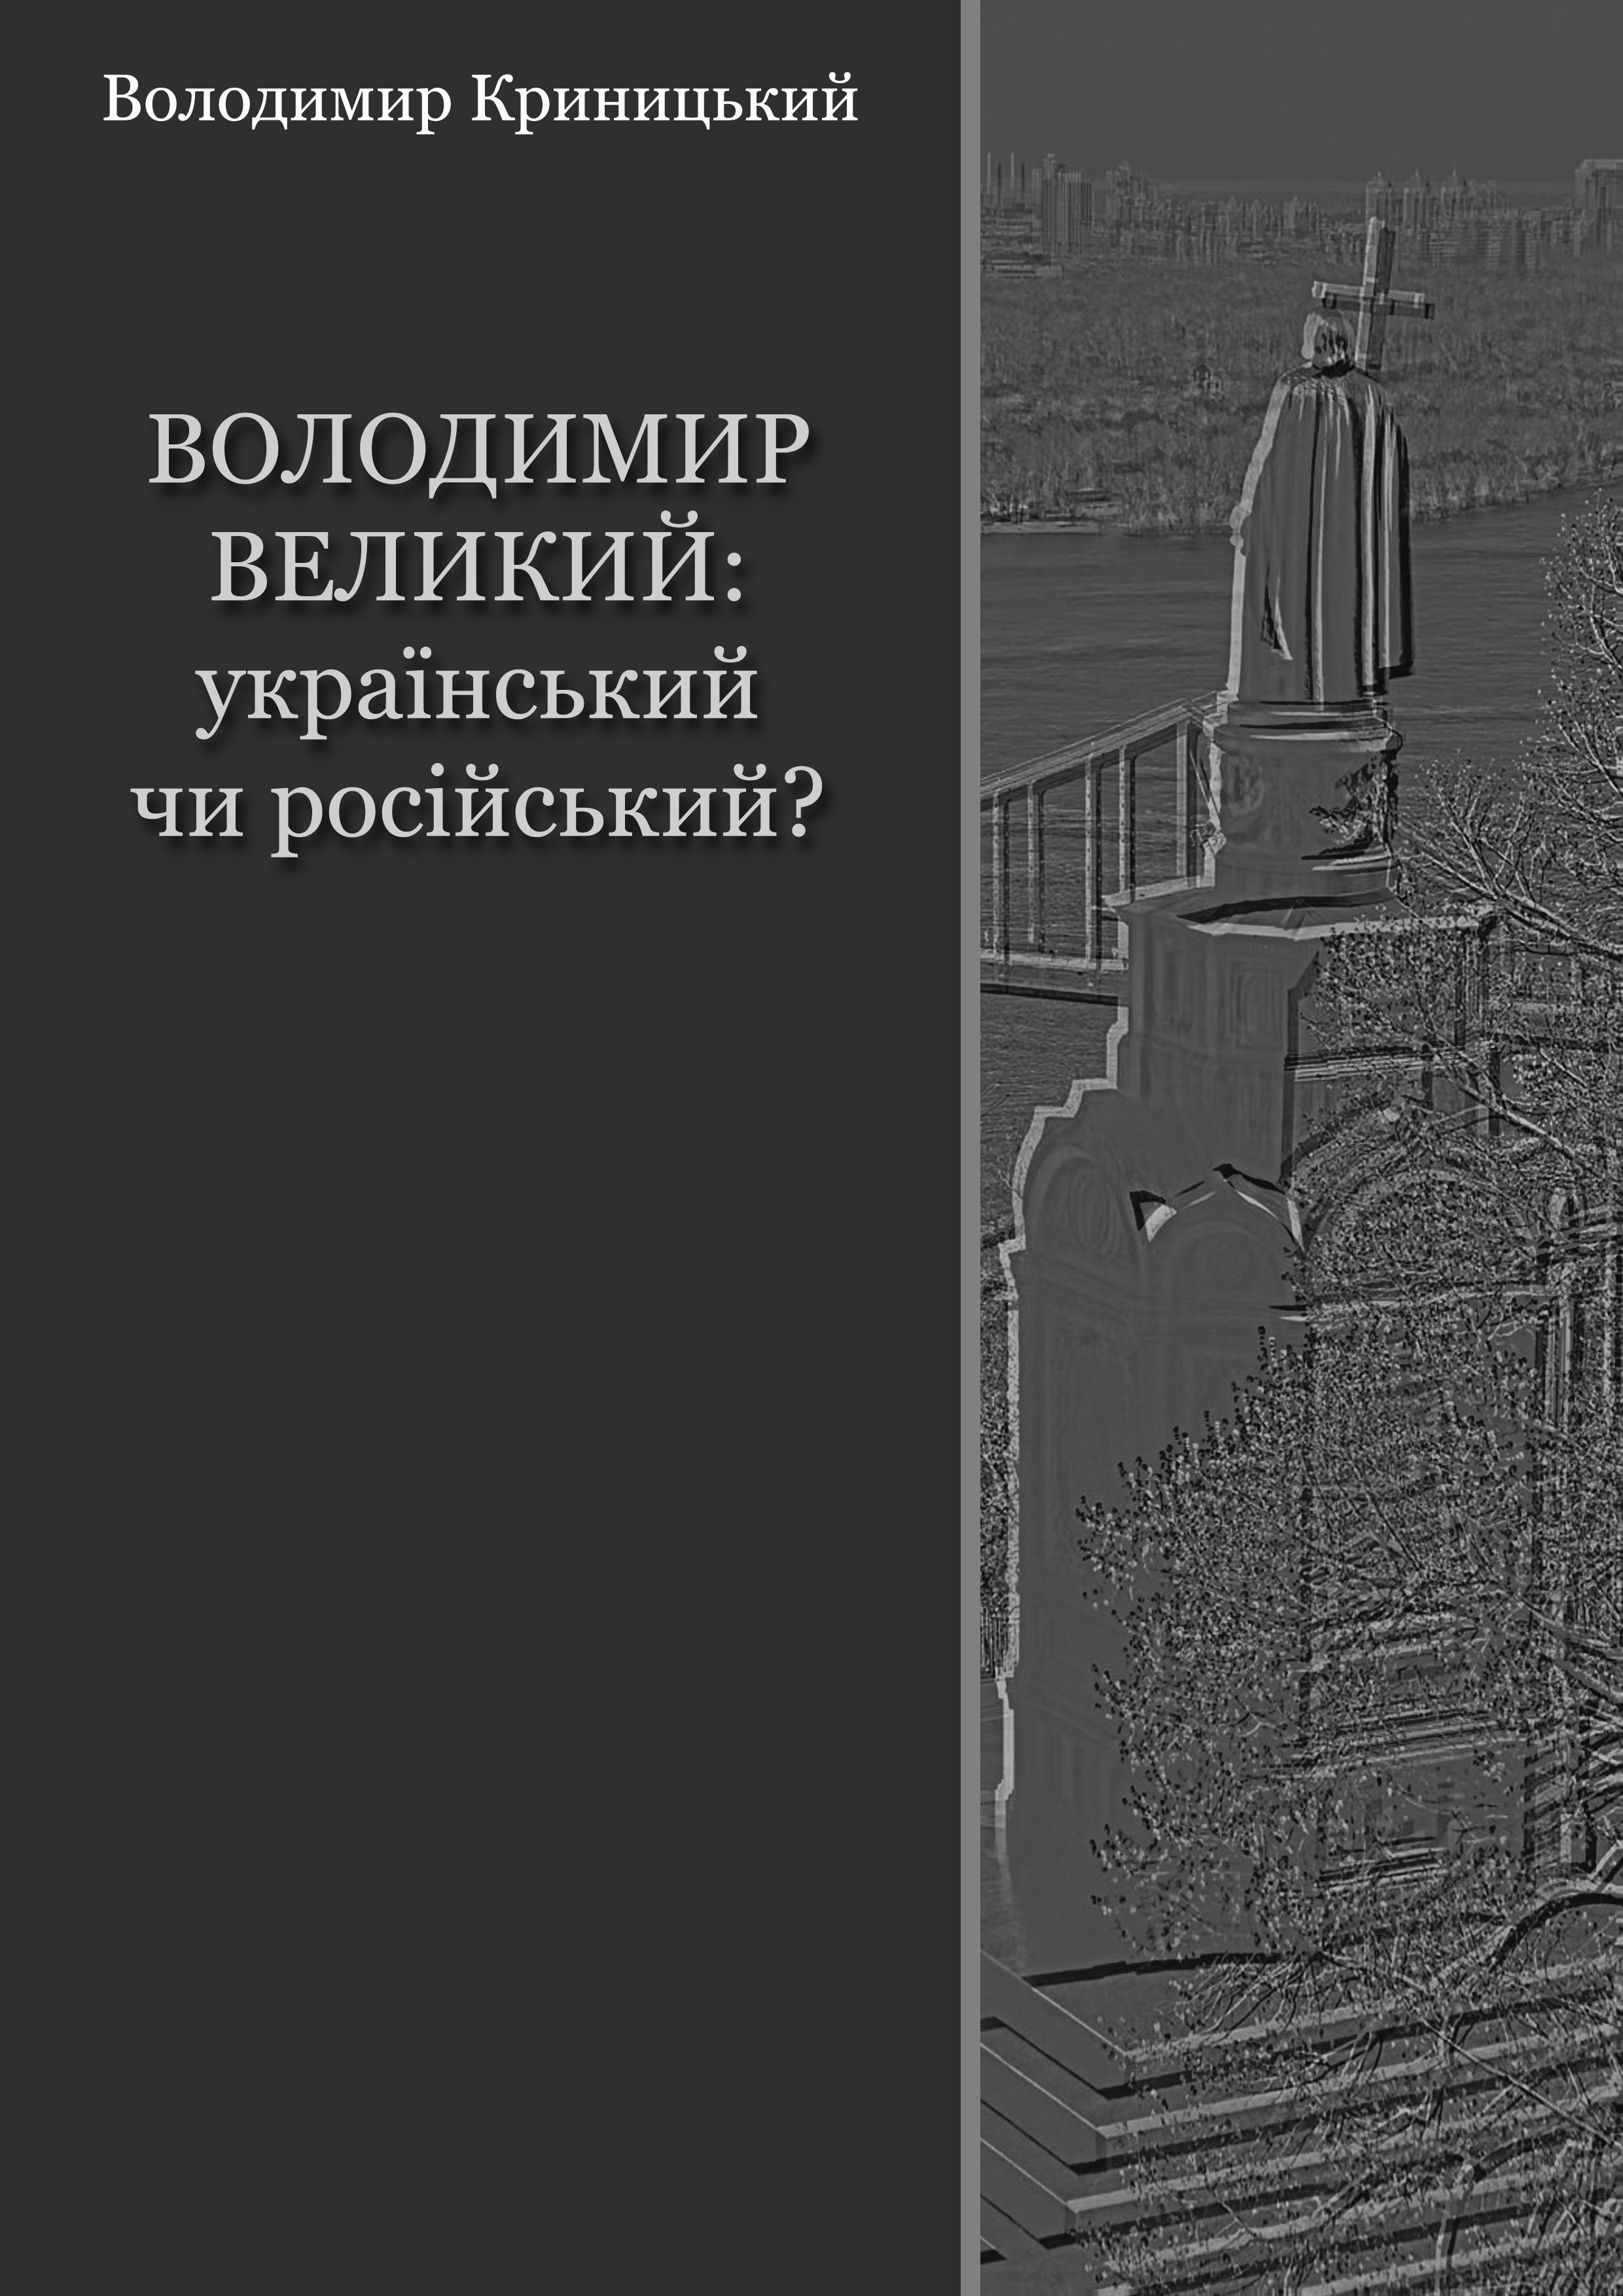 Володимир Великий: український чи російський?  by  Volodymyr Krynytsky